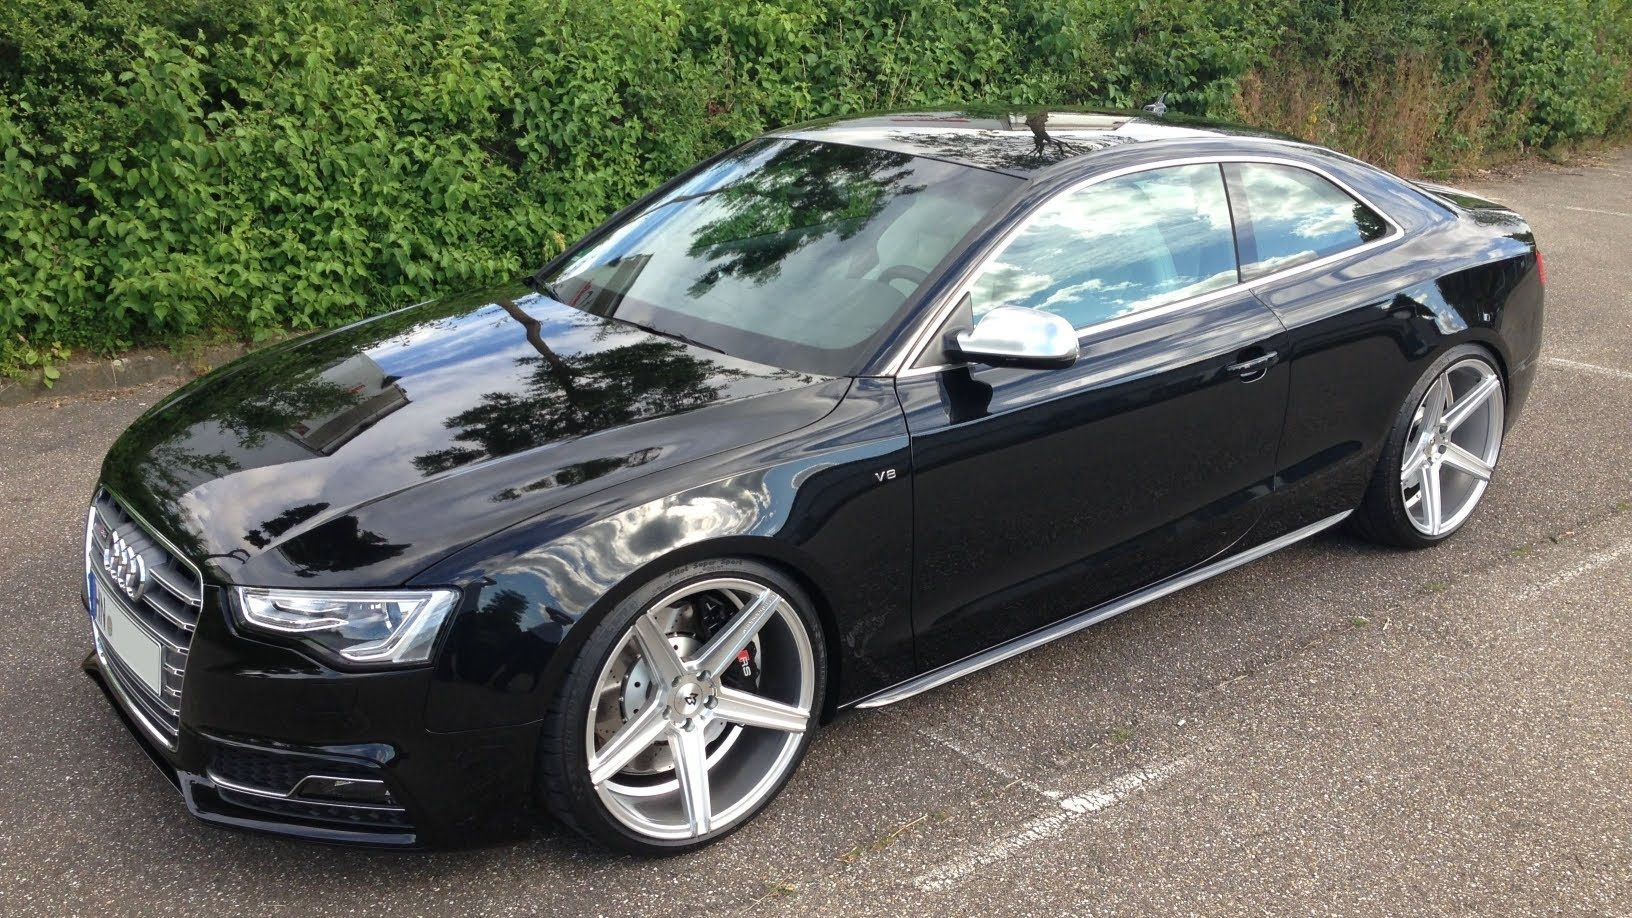 Kelebihan S5 V8 Harga